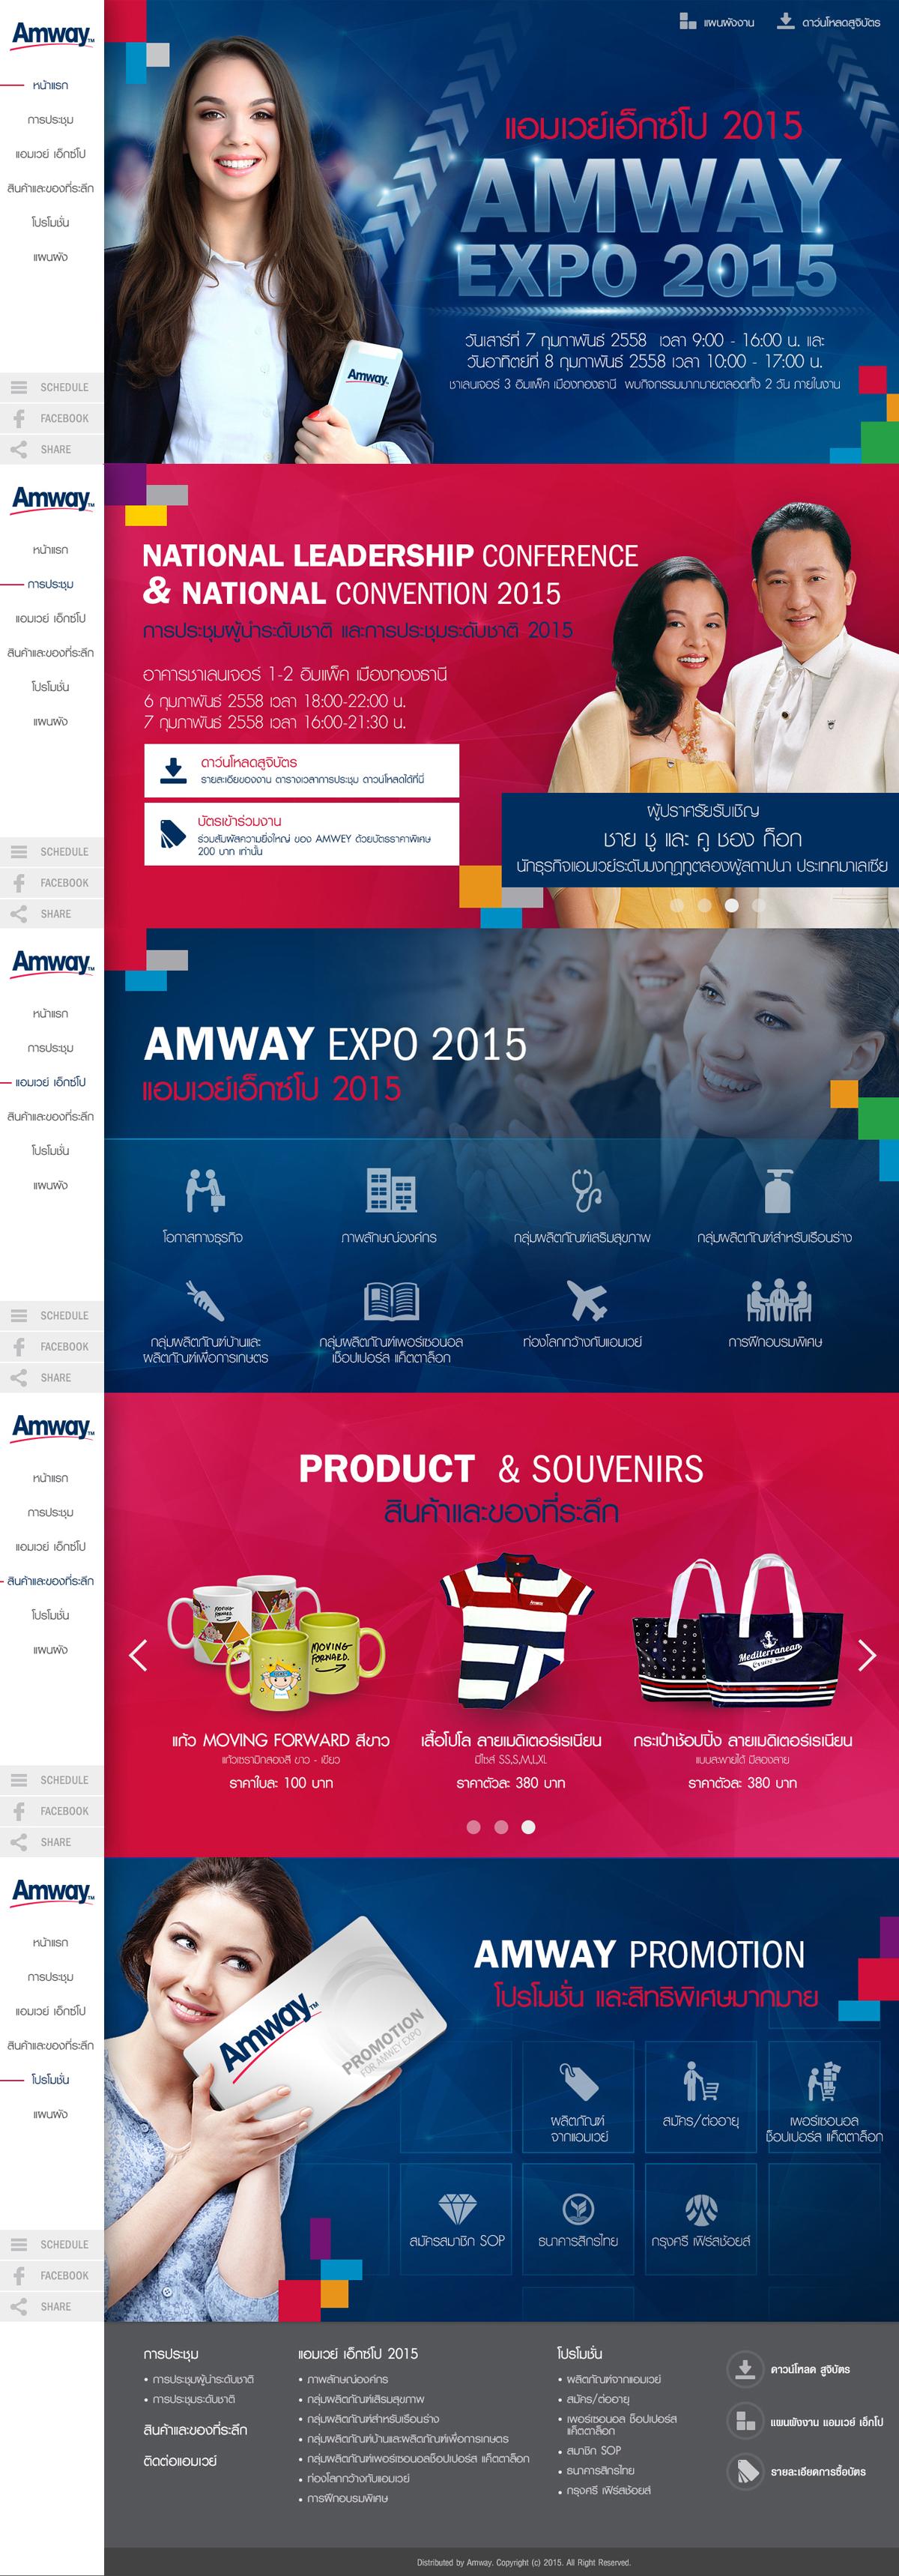 08-amway-04